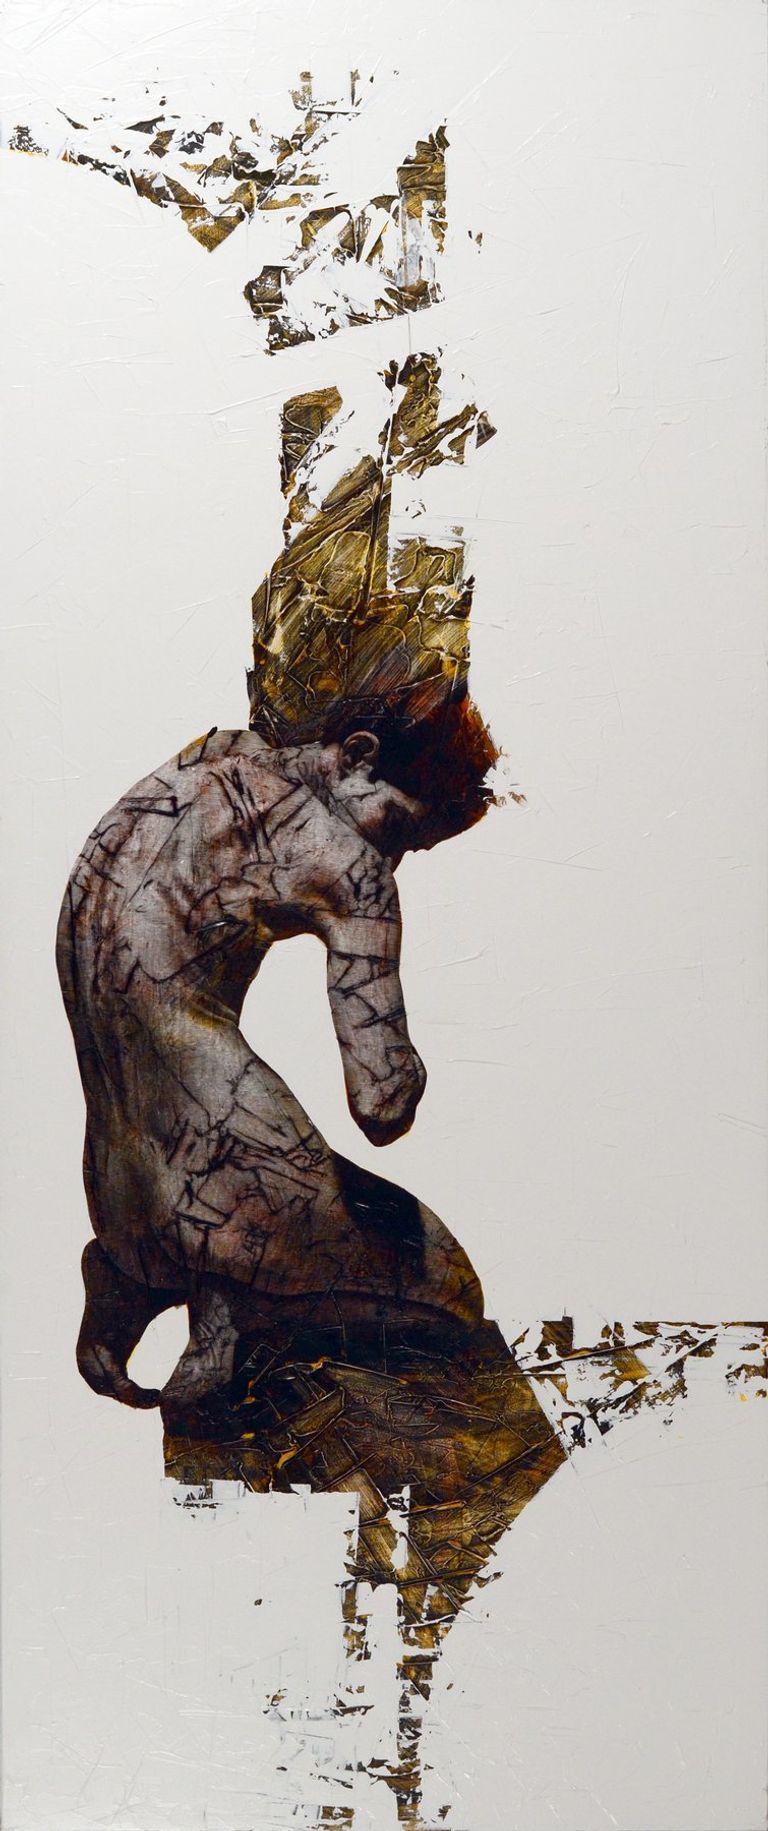 adrian leverkuhn, painting, The Empire in Denial